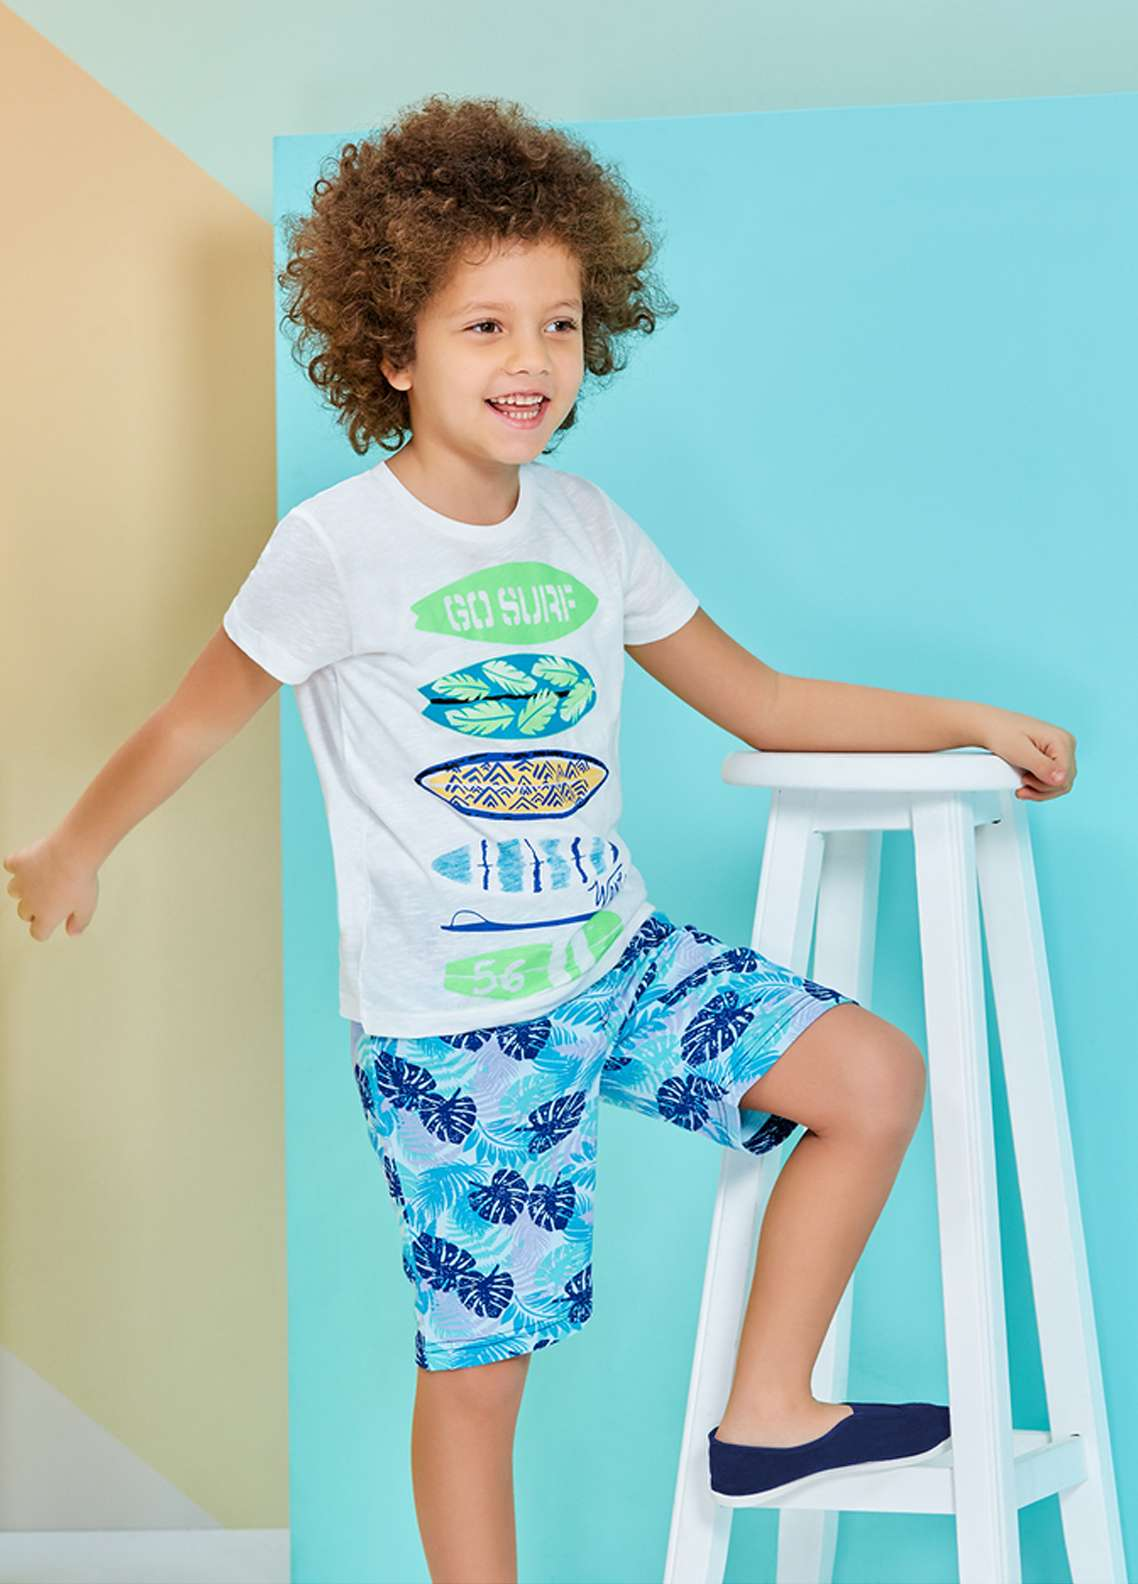 Cotton Net Nightwear for Kids 2 Piece NS18K 1221 WHITE